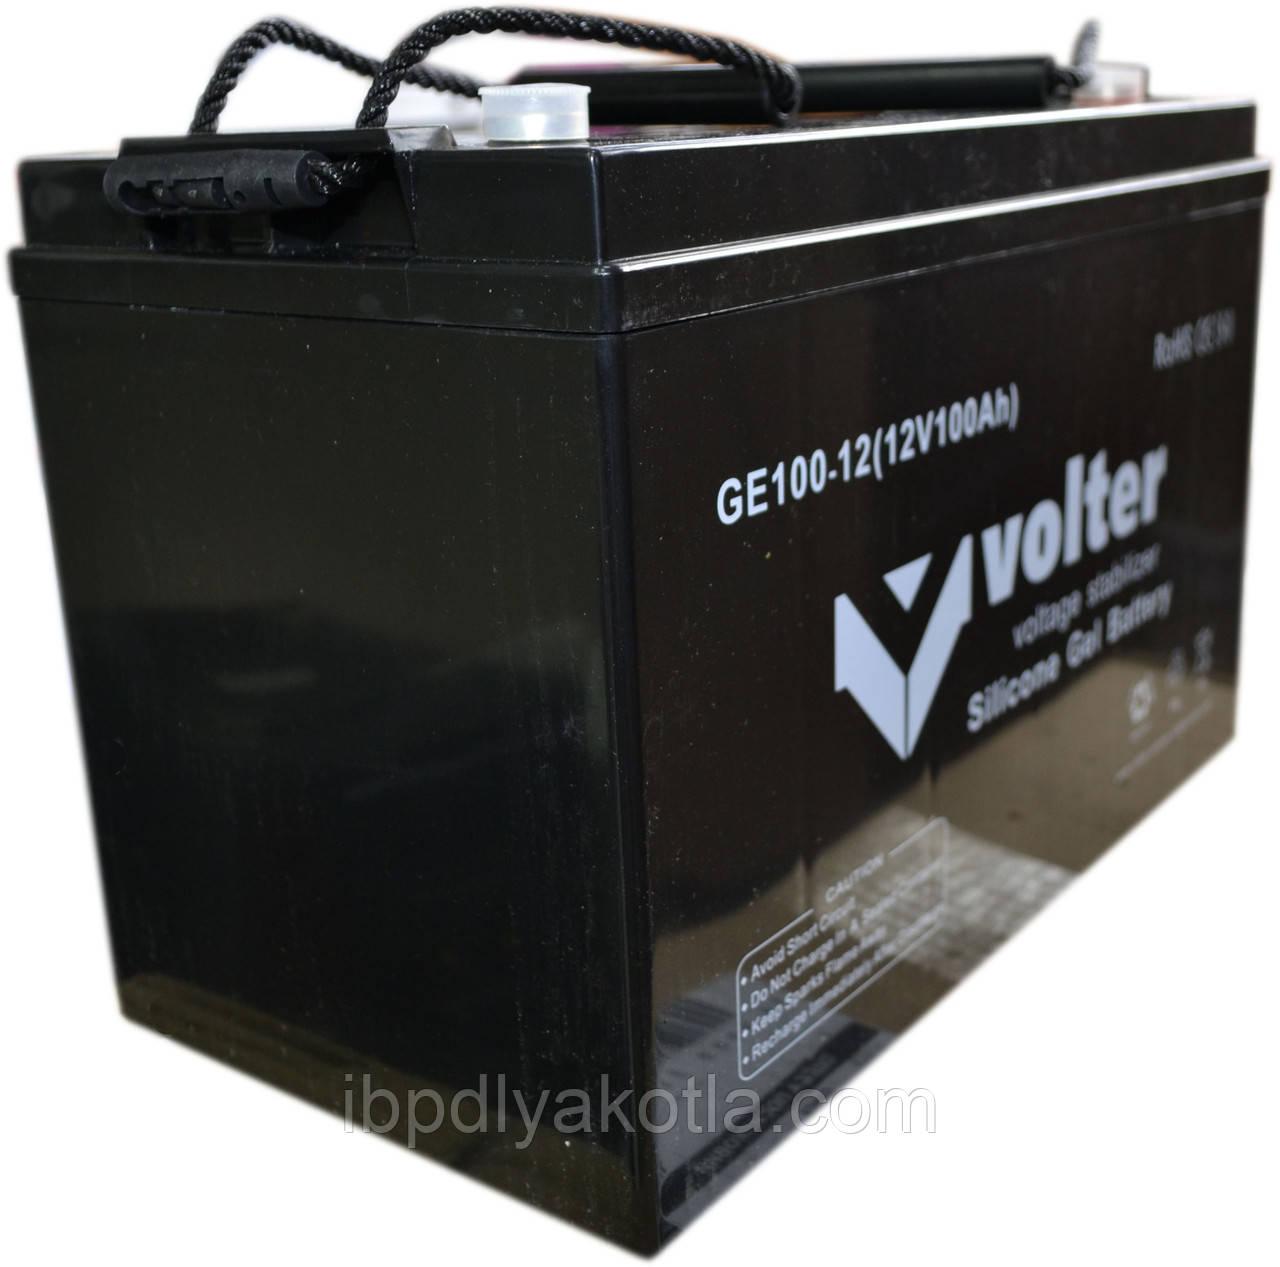 Volter GE100-12 100AH